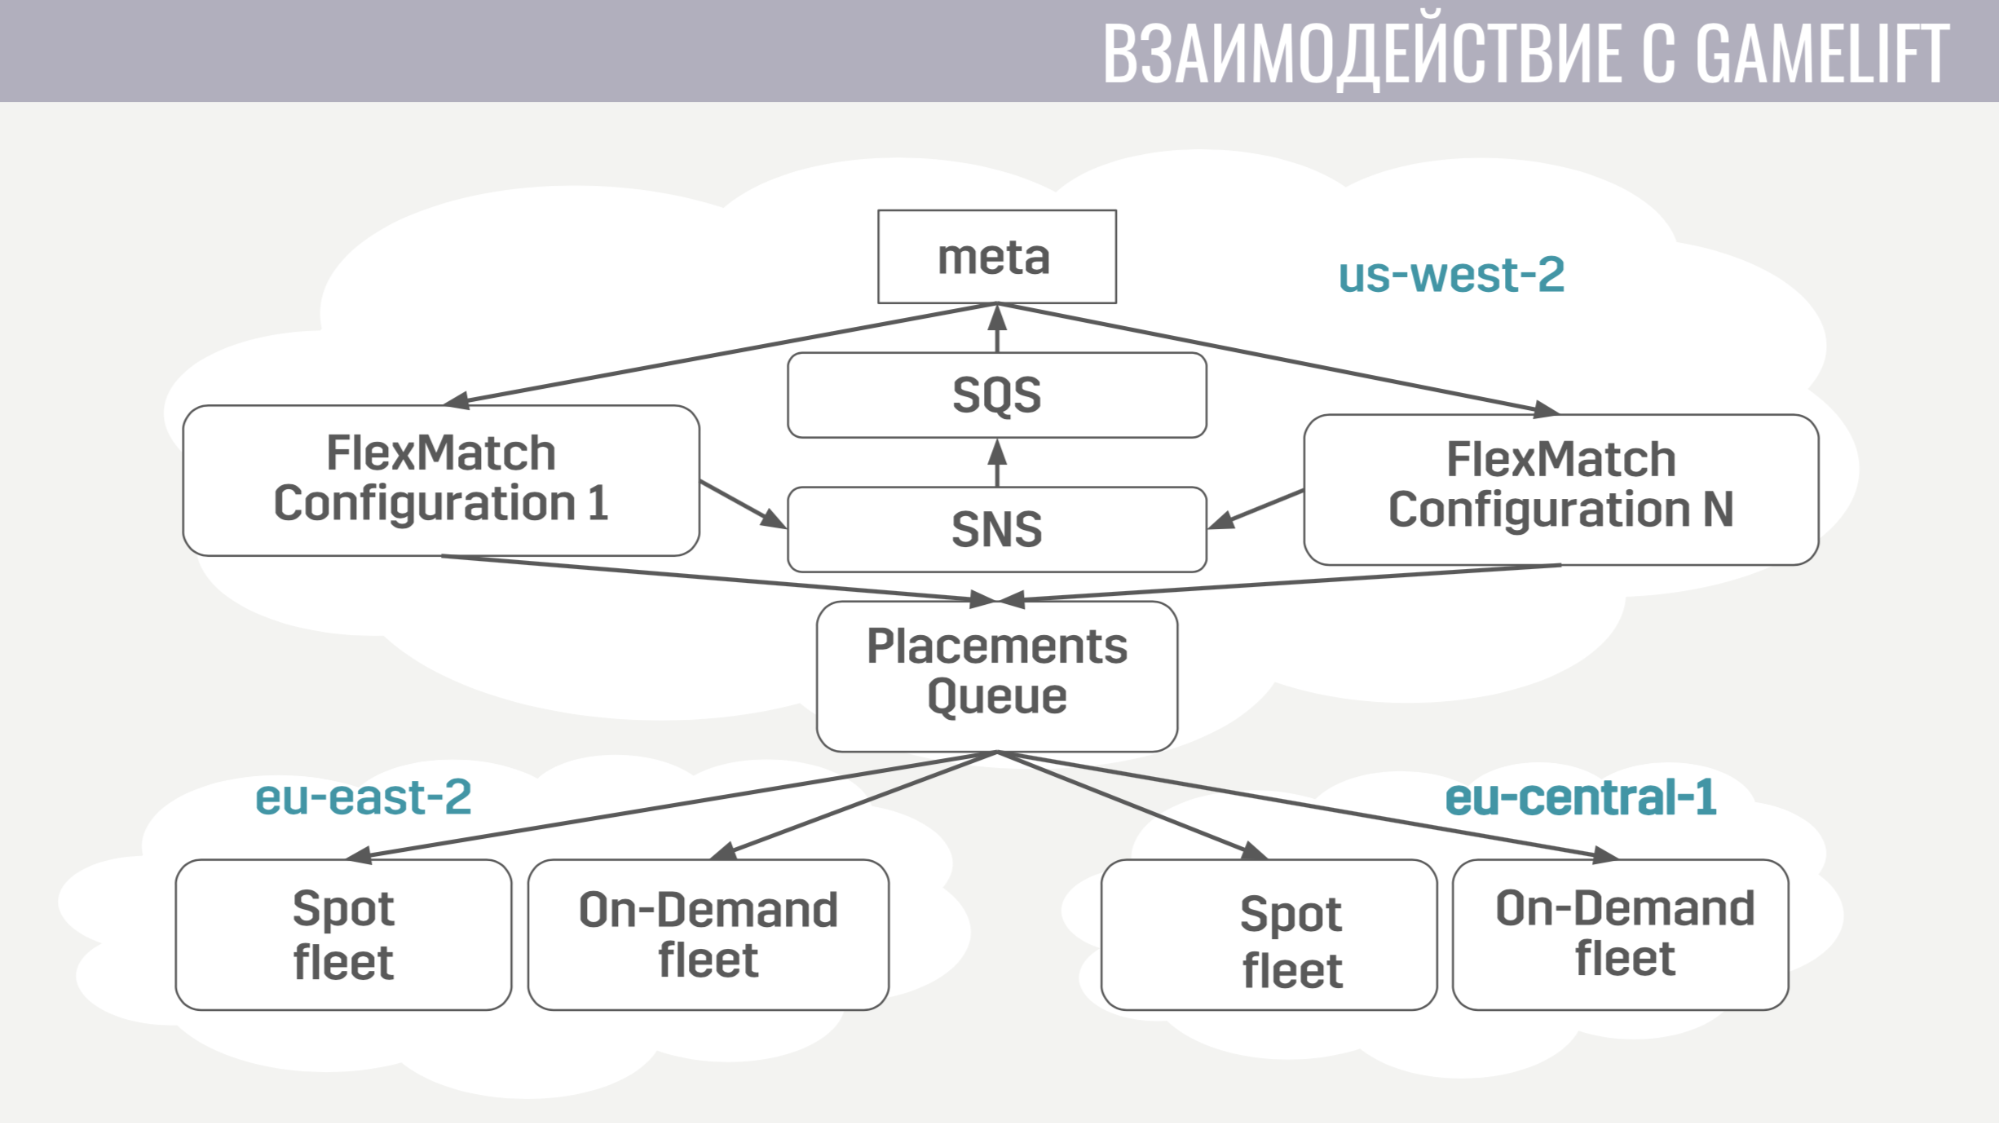 Архитектура мета-сервера мобильного онлайн-шутера Tacticool - 10